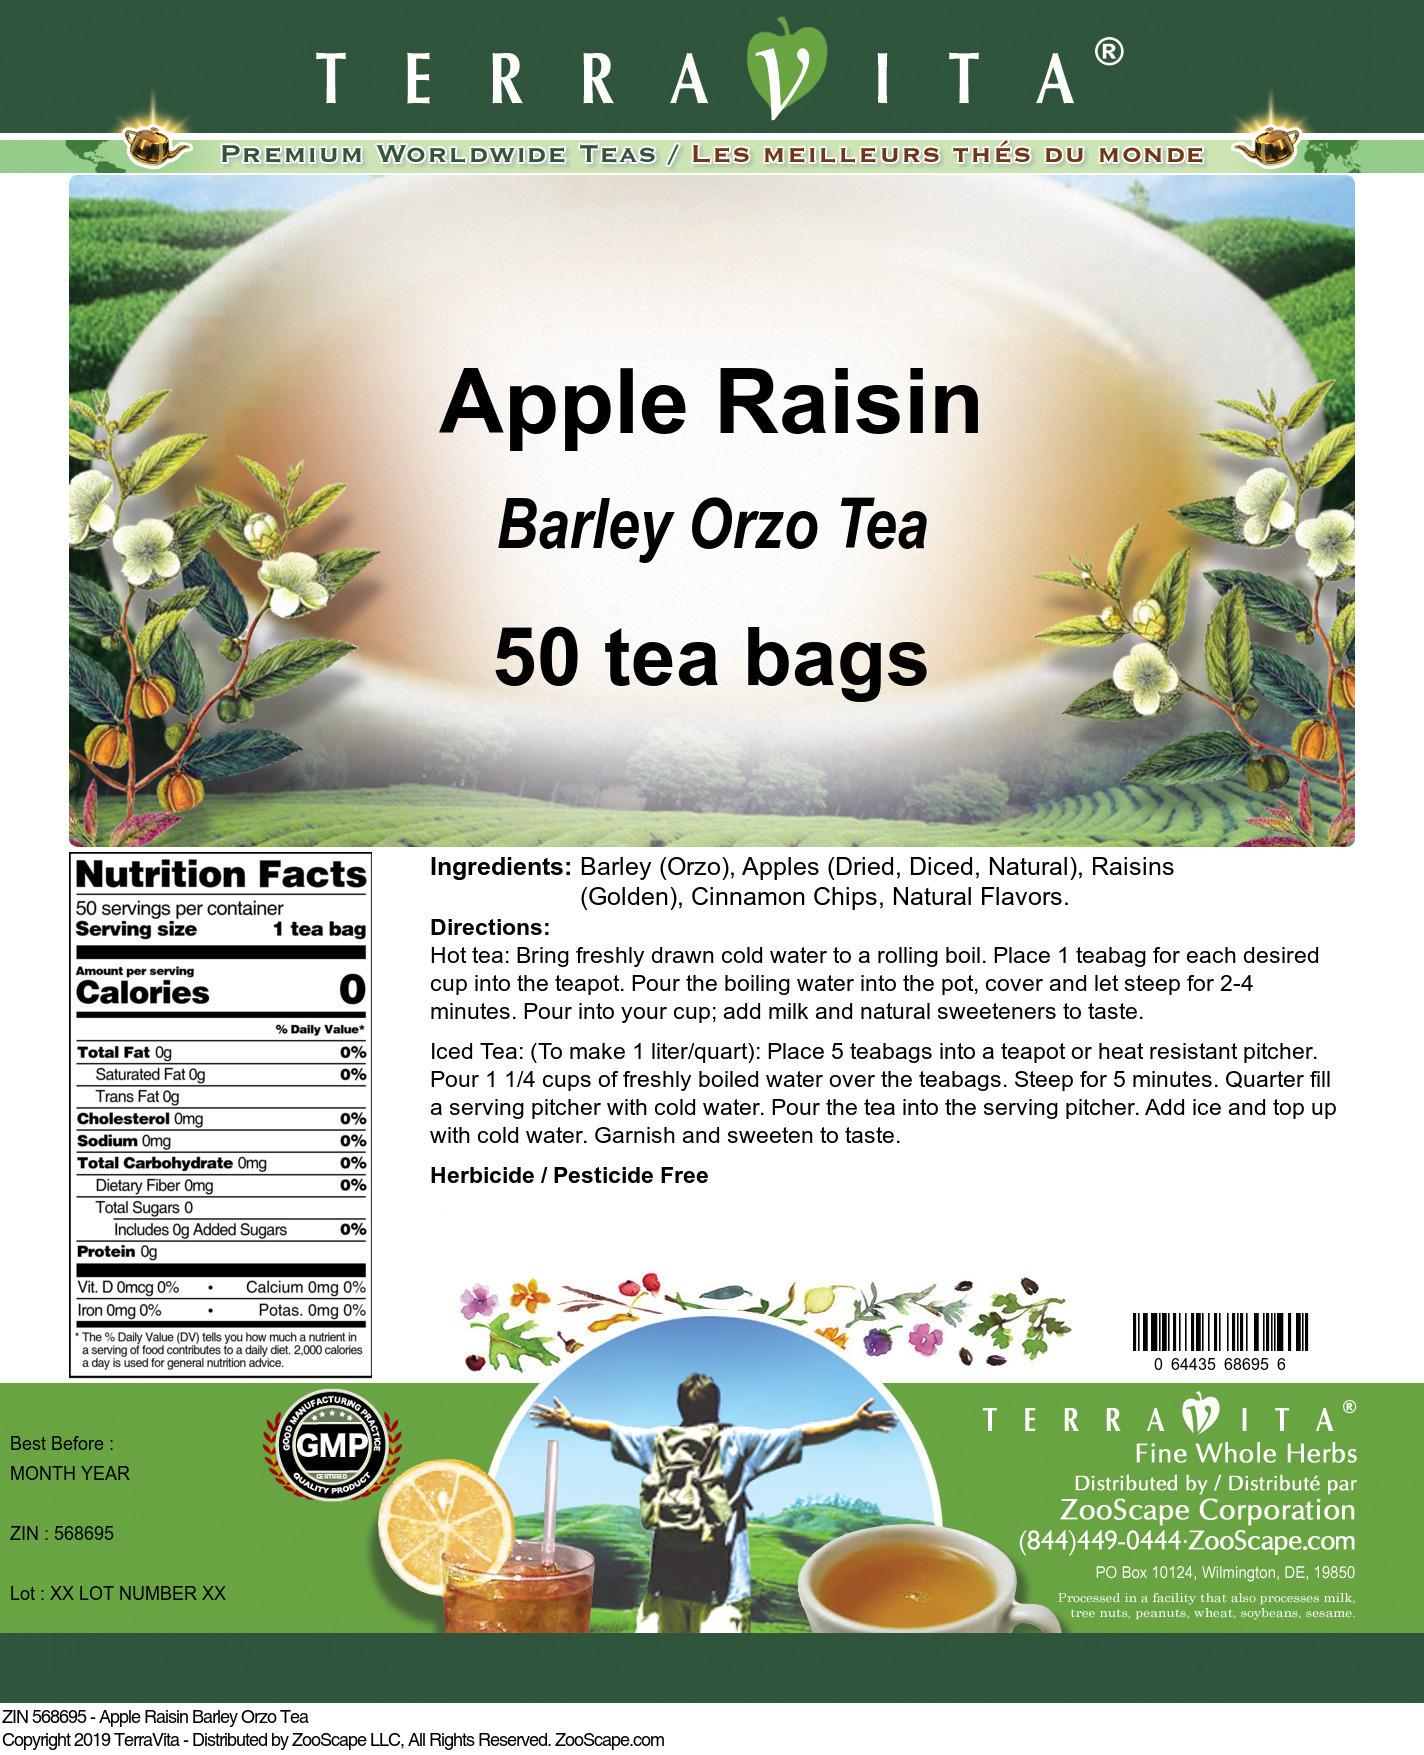 Apple Raisin Barley Orzo Tea